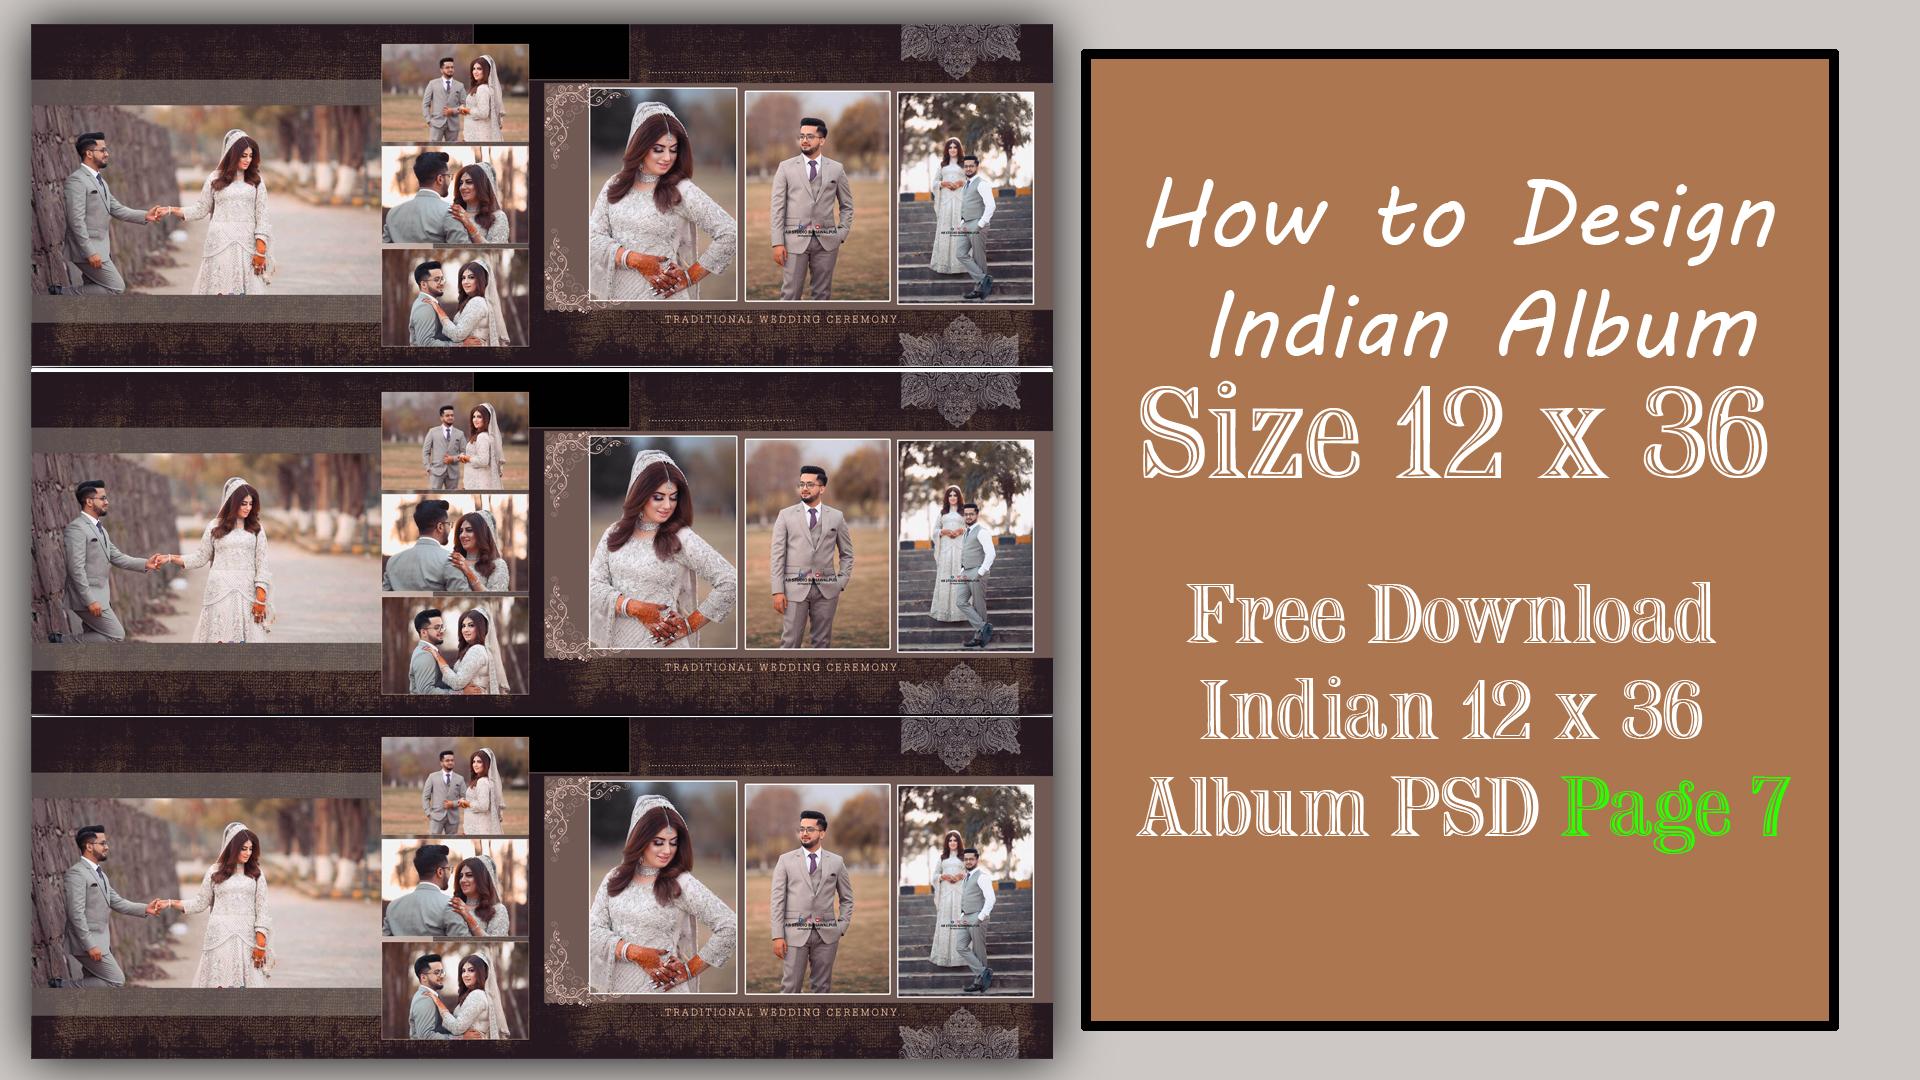 Wedding album design psd free download 12x36 2021